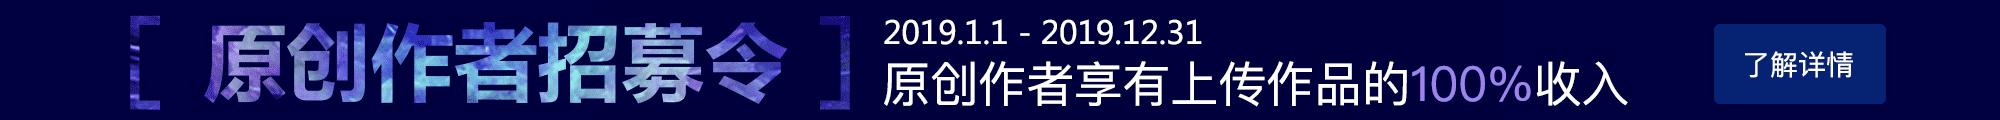 www.yrucd.com 云瑞原创作者招募令